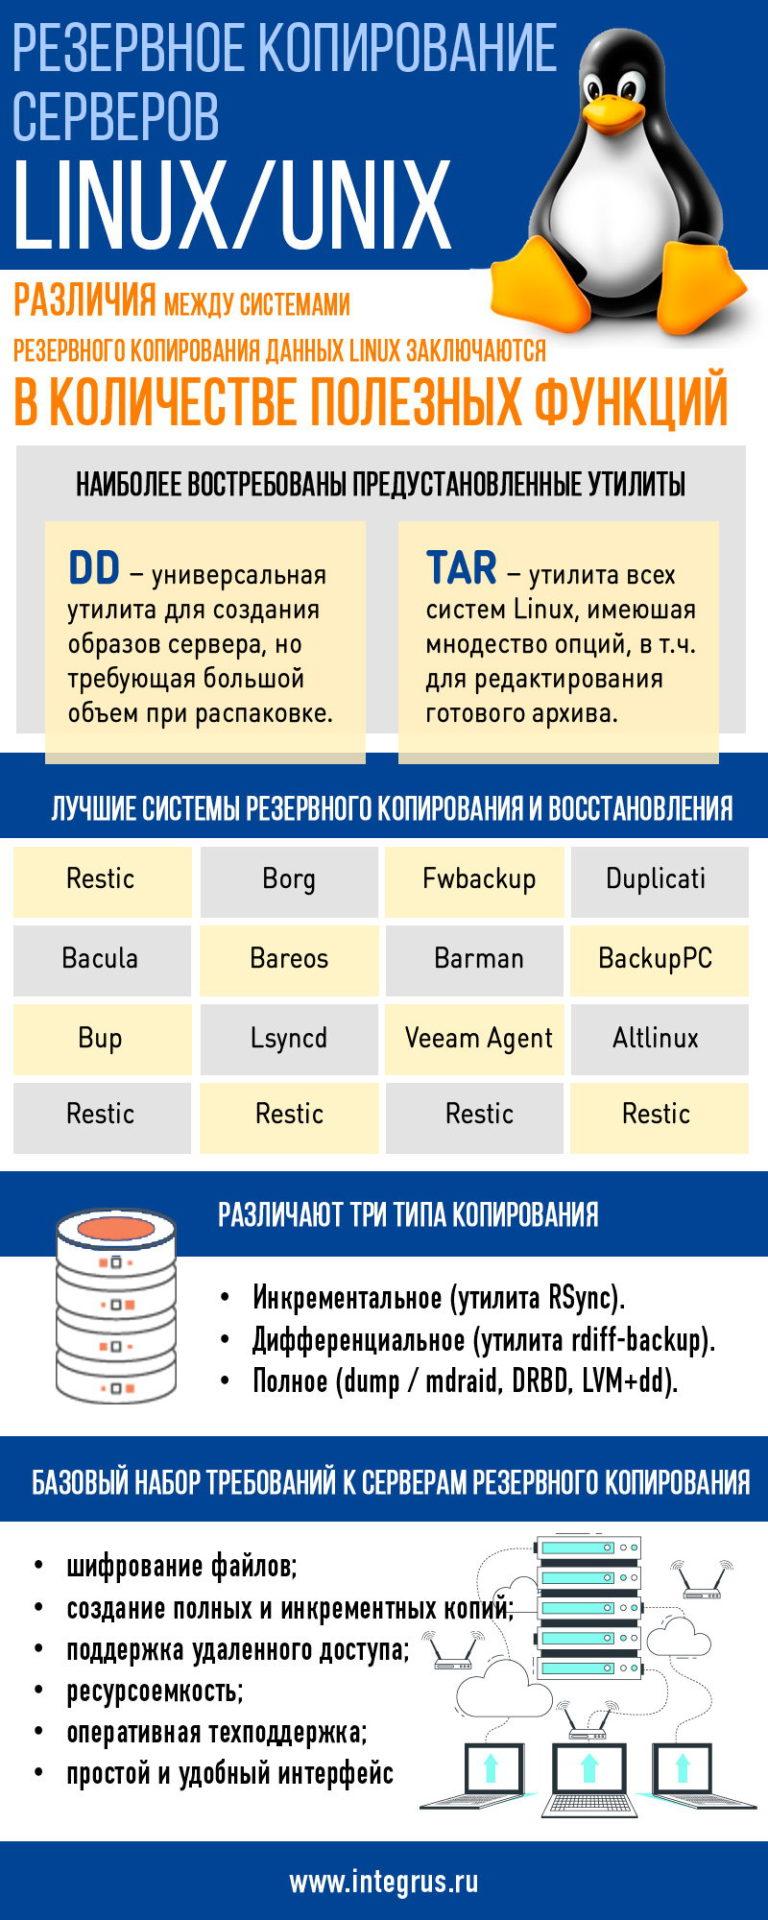 Backup серверов Unix и Linux